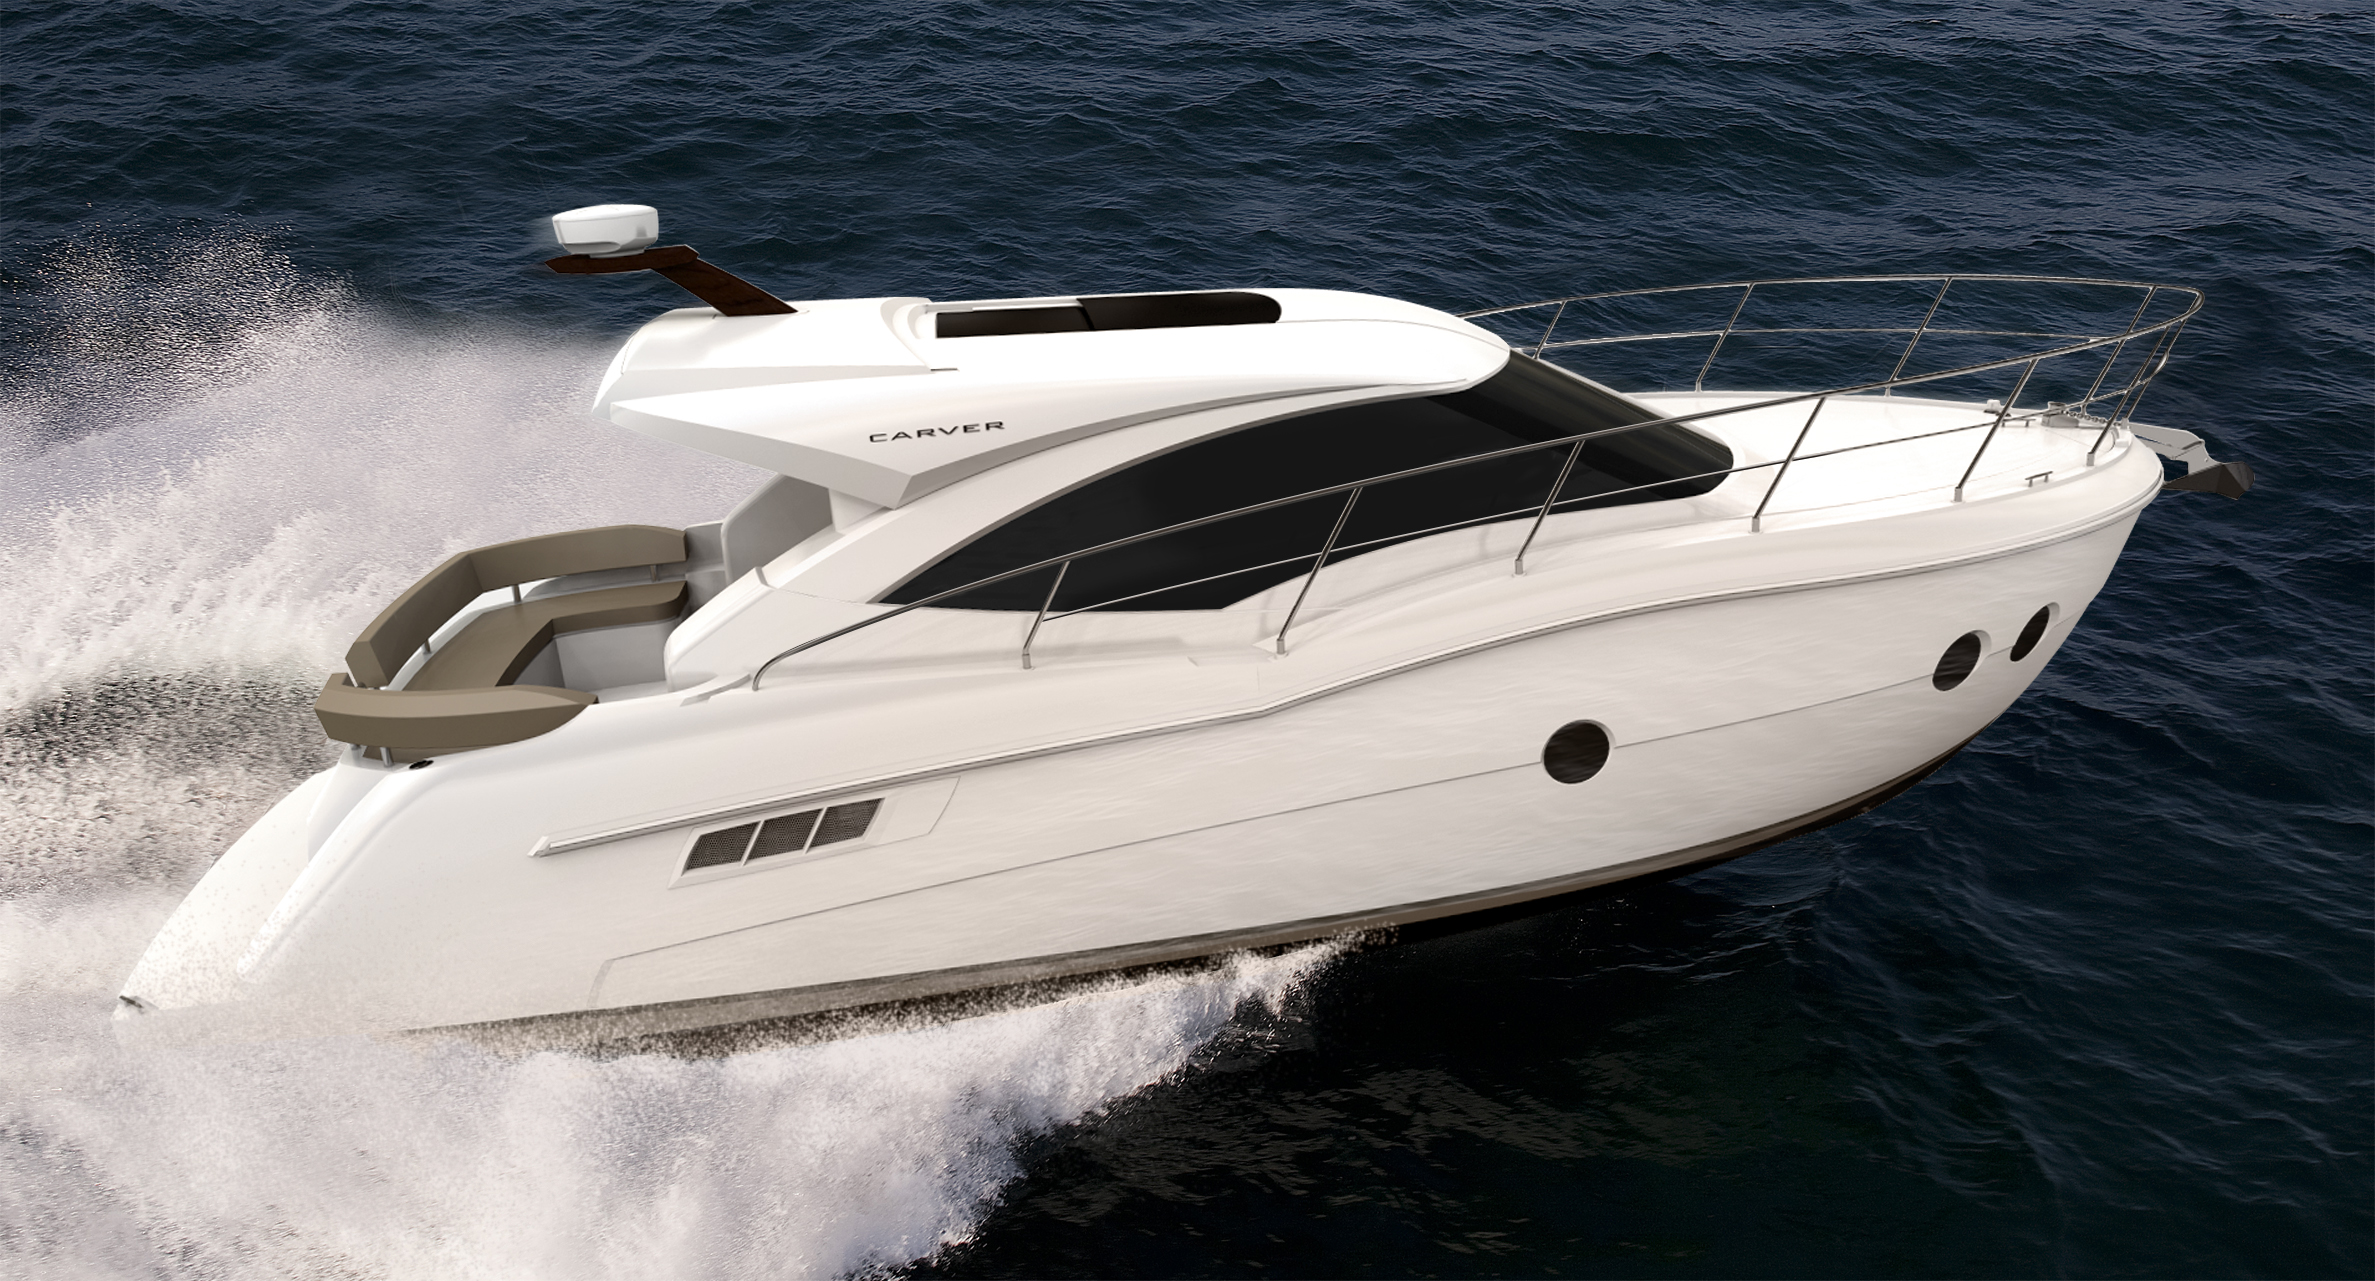 Carver C37 - Carver Yachts